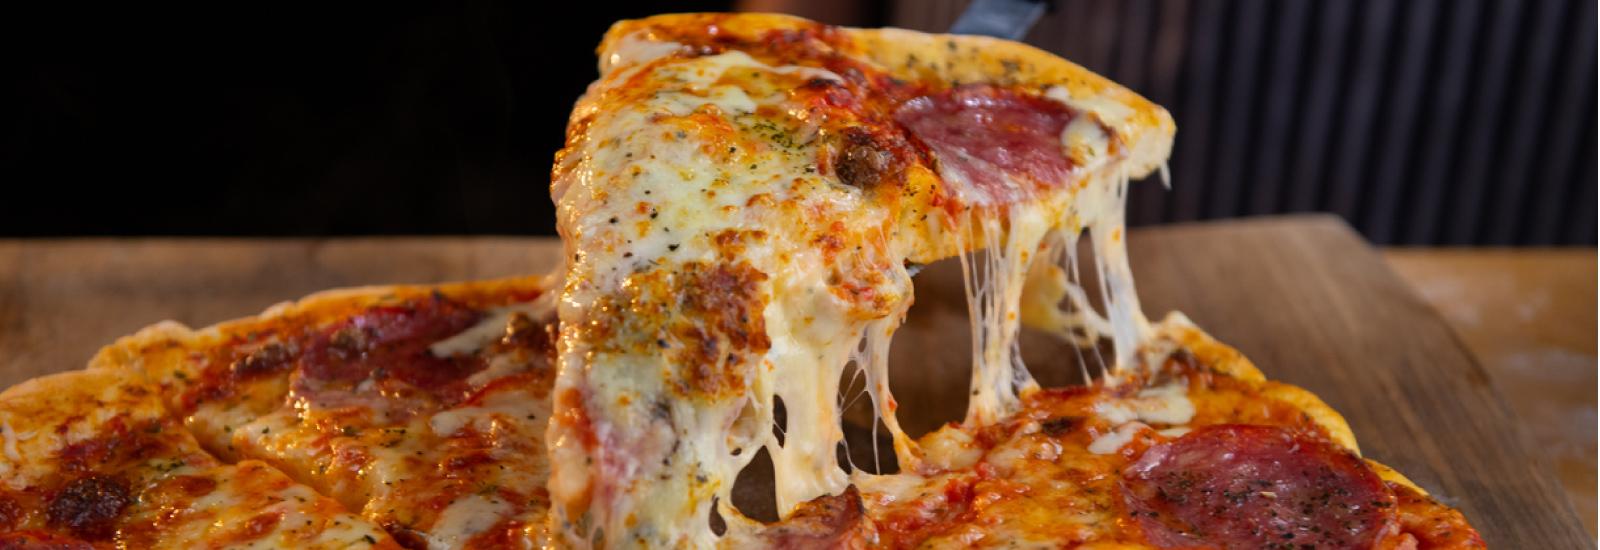 Panama City Pizza